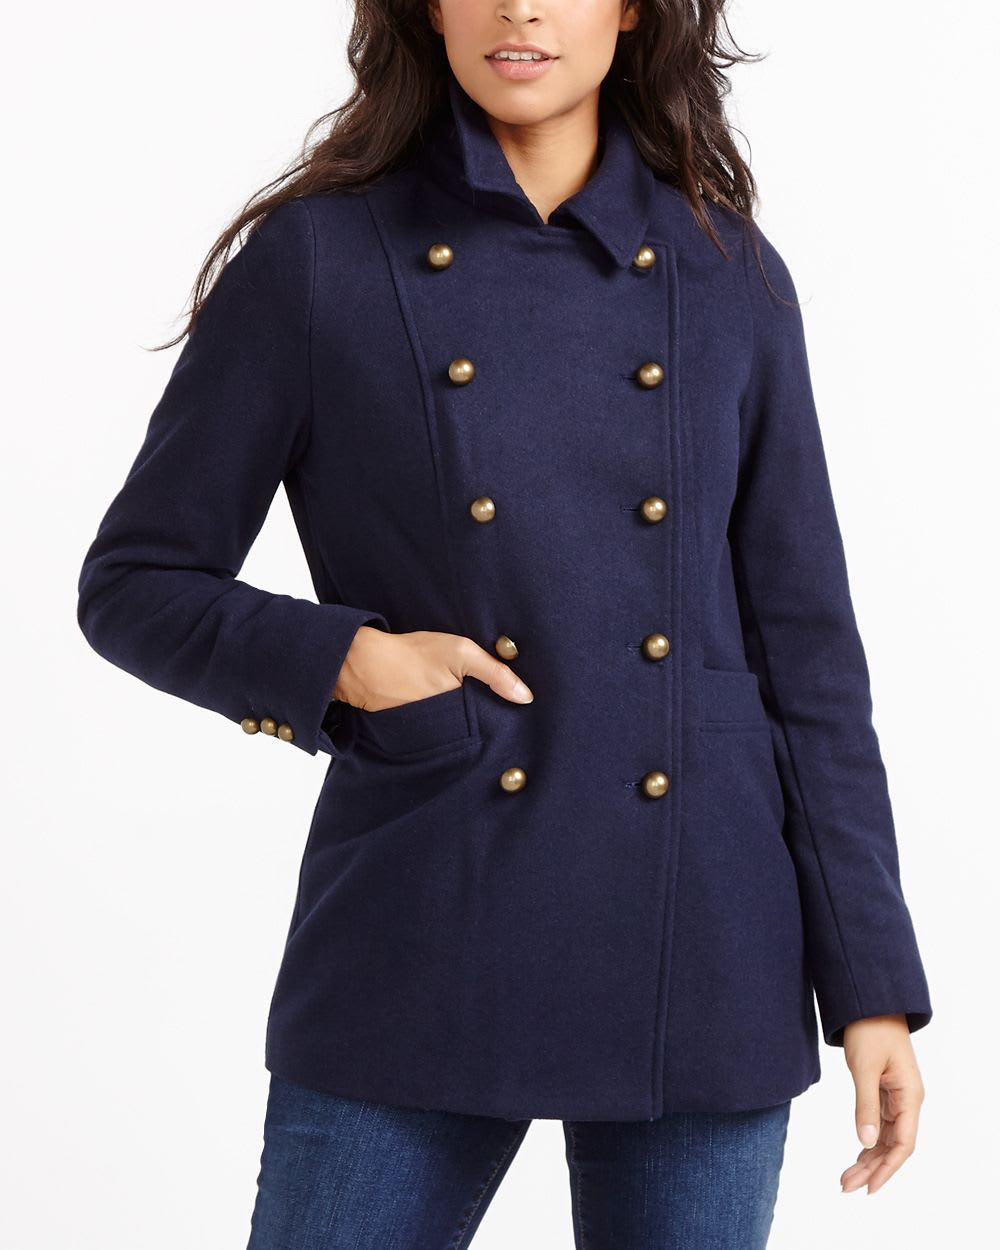 Classic pea coat women